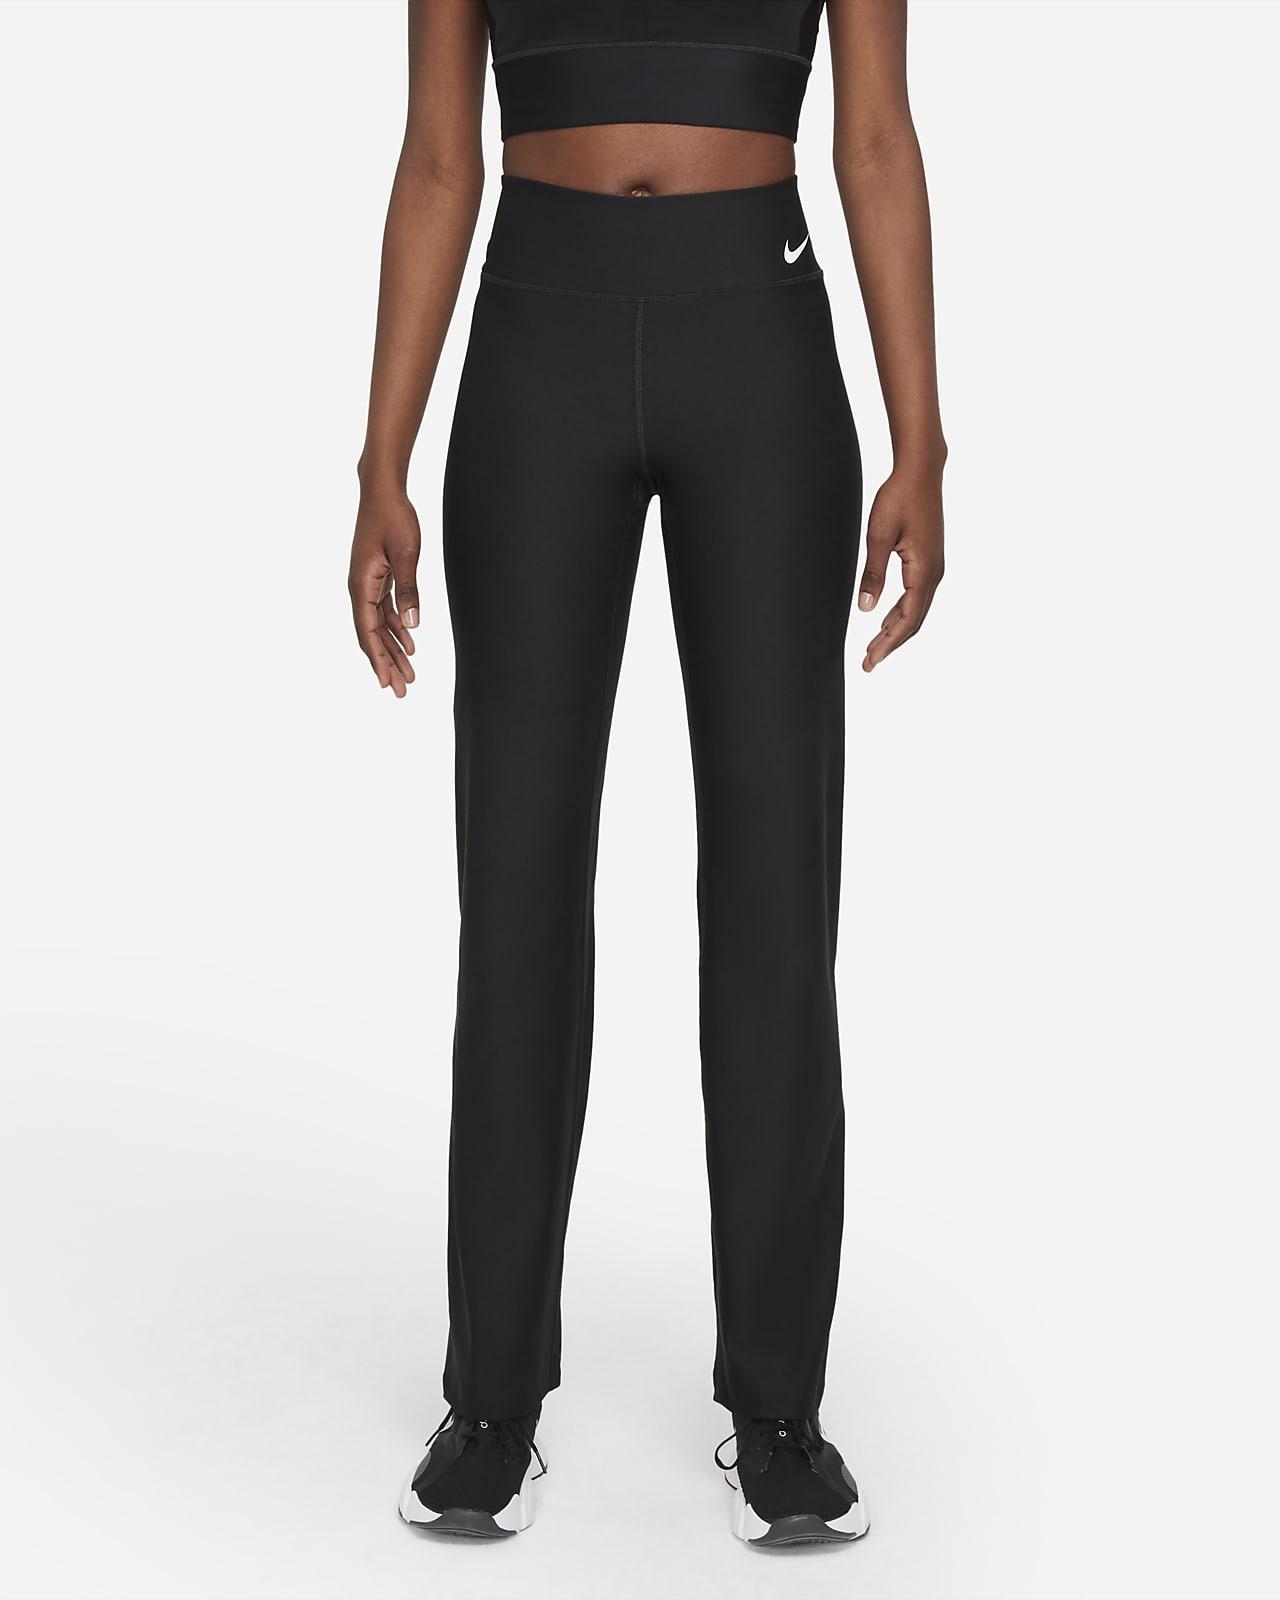 Nike Power Women's Training Pants